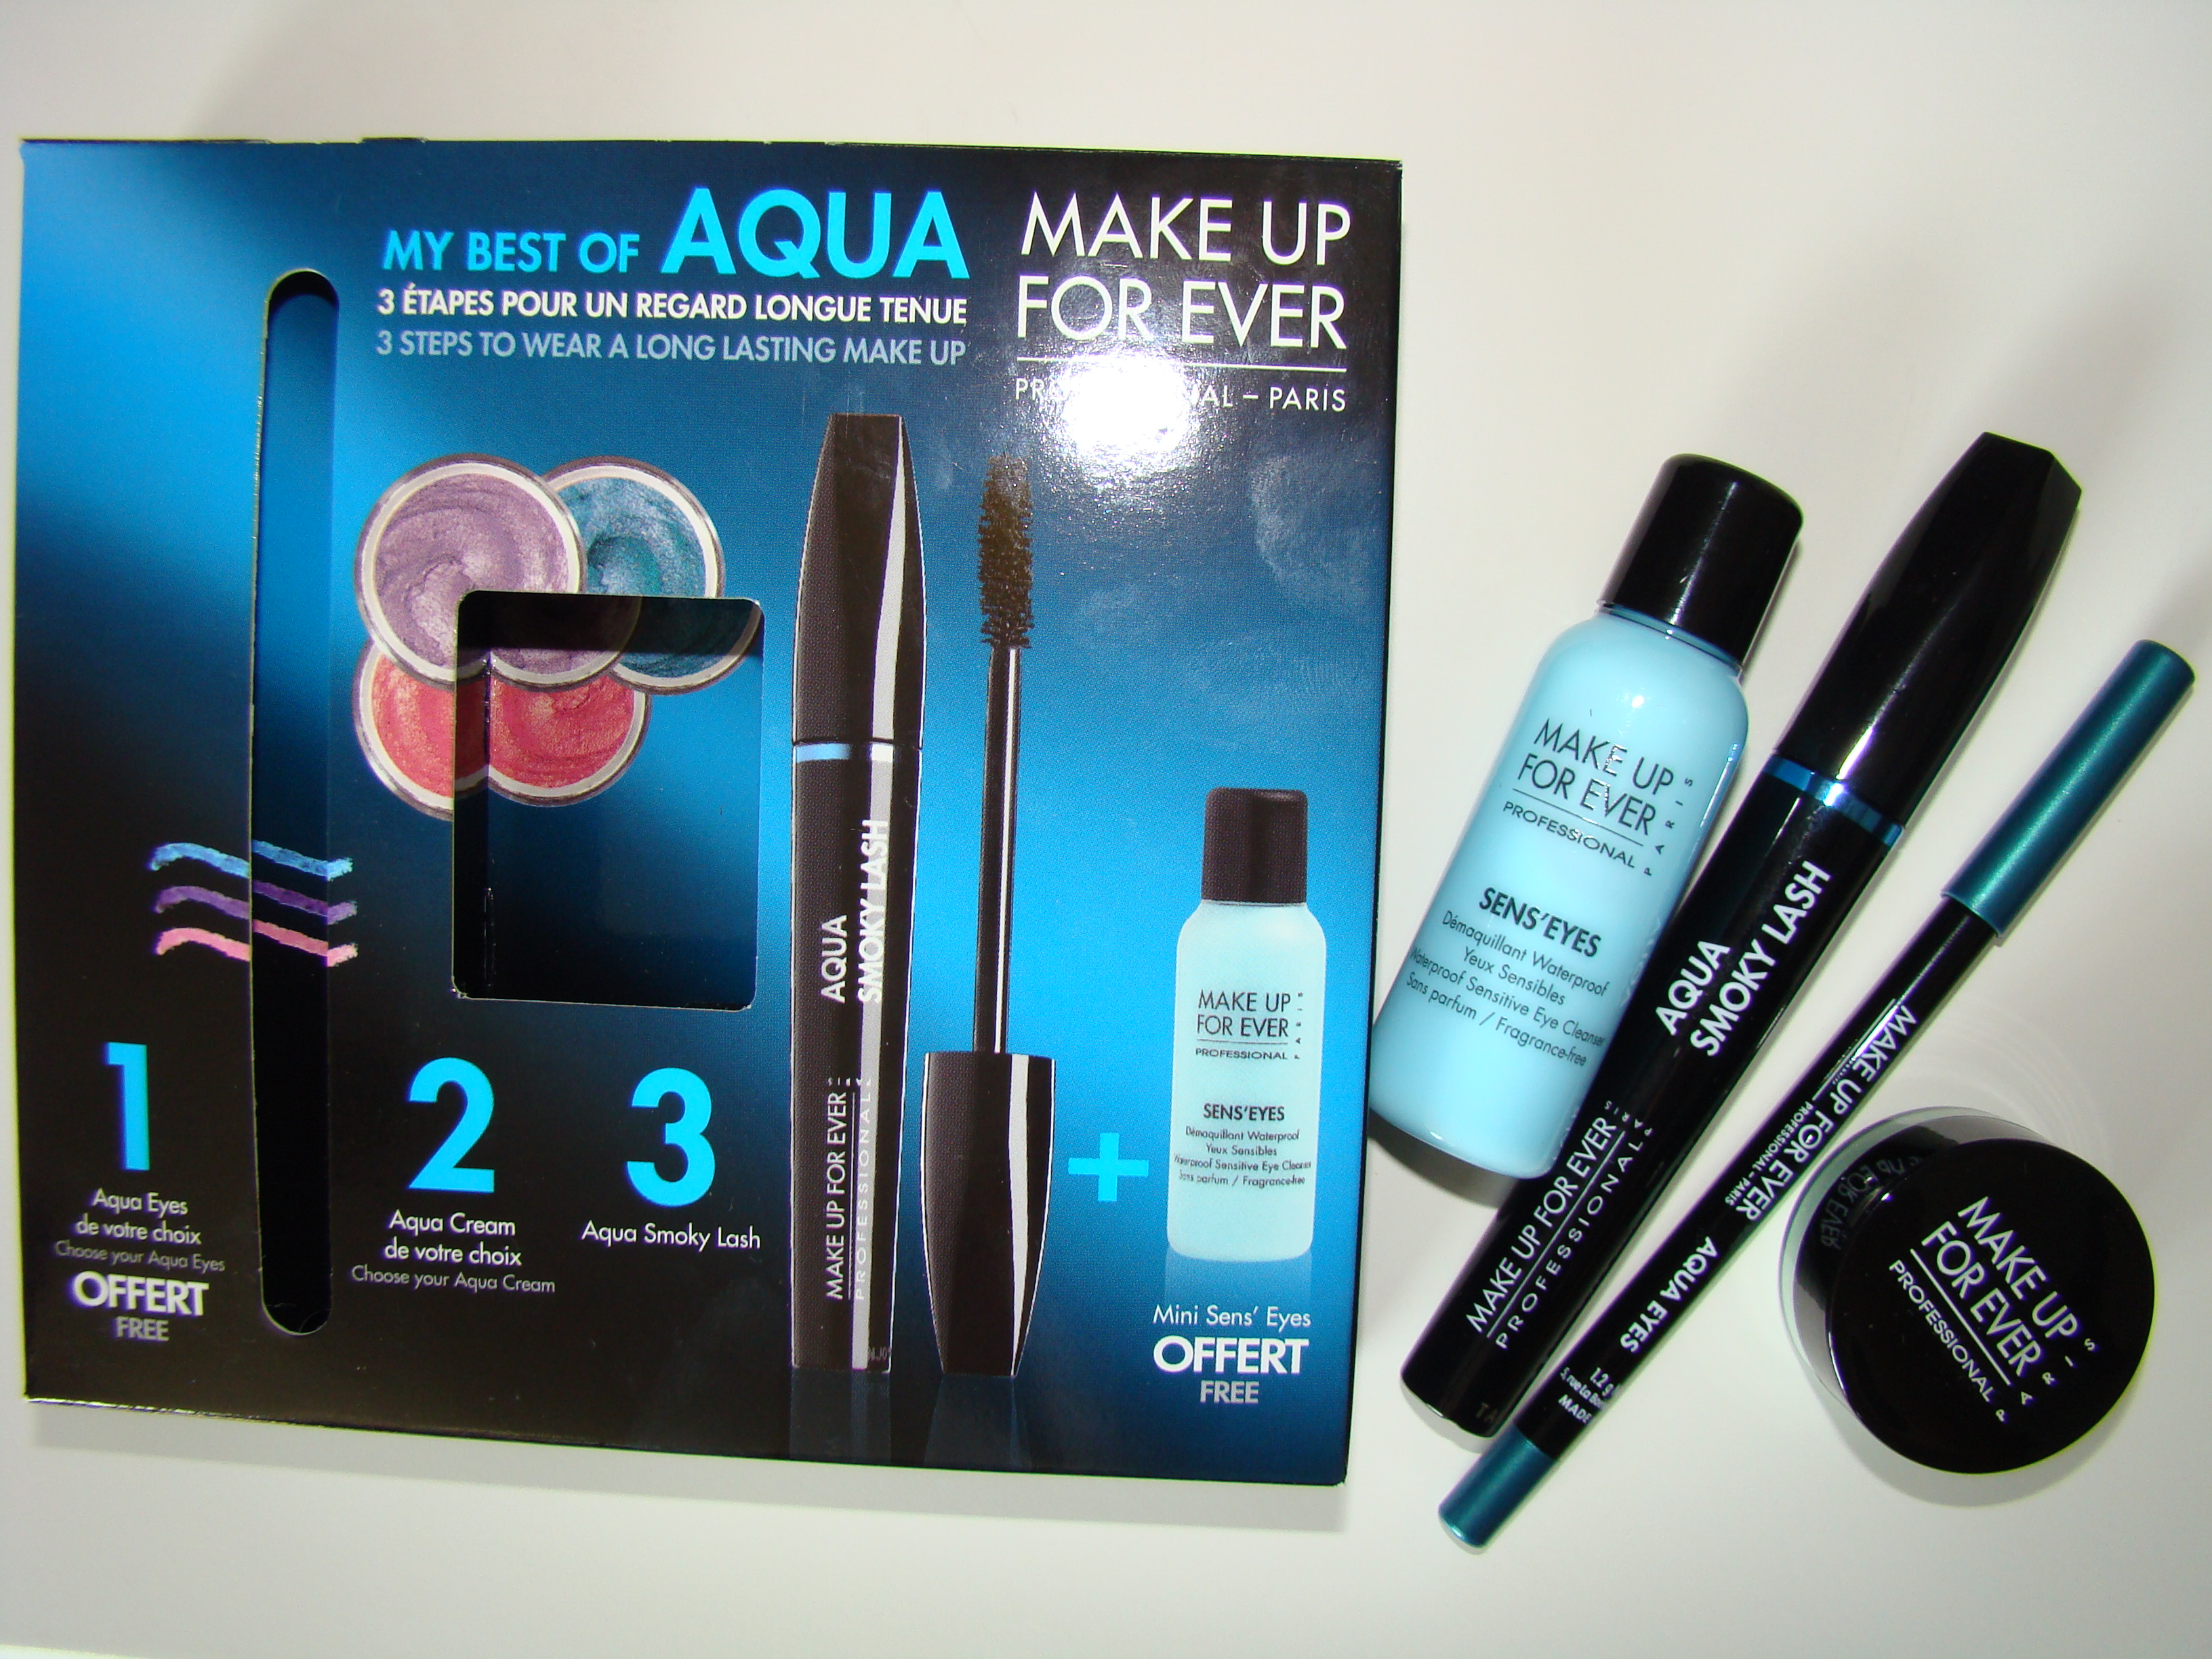 new make up forever aqua products vickisbeauty. Black Bedroom Furniture Sets. Home Design Ideas